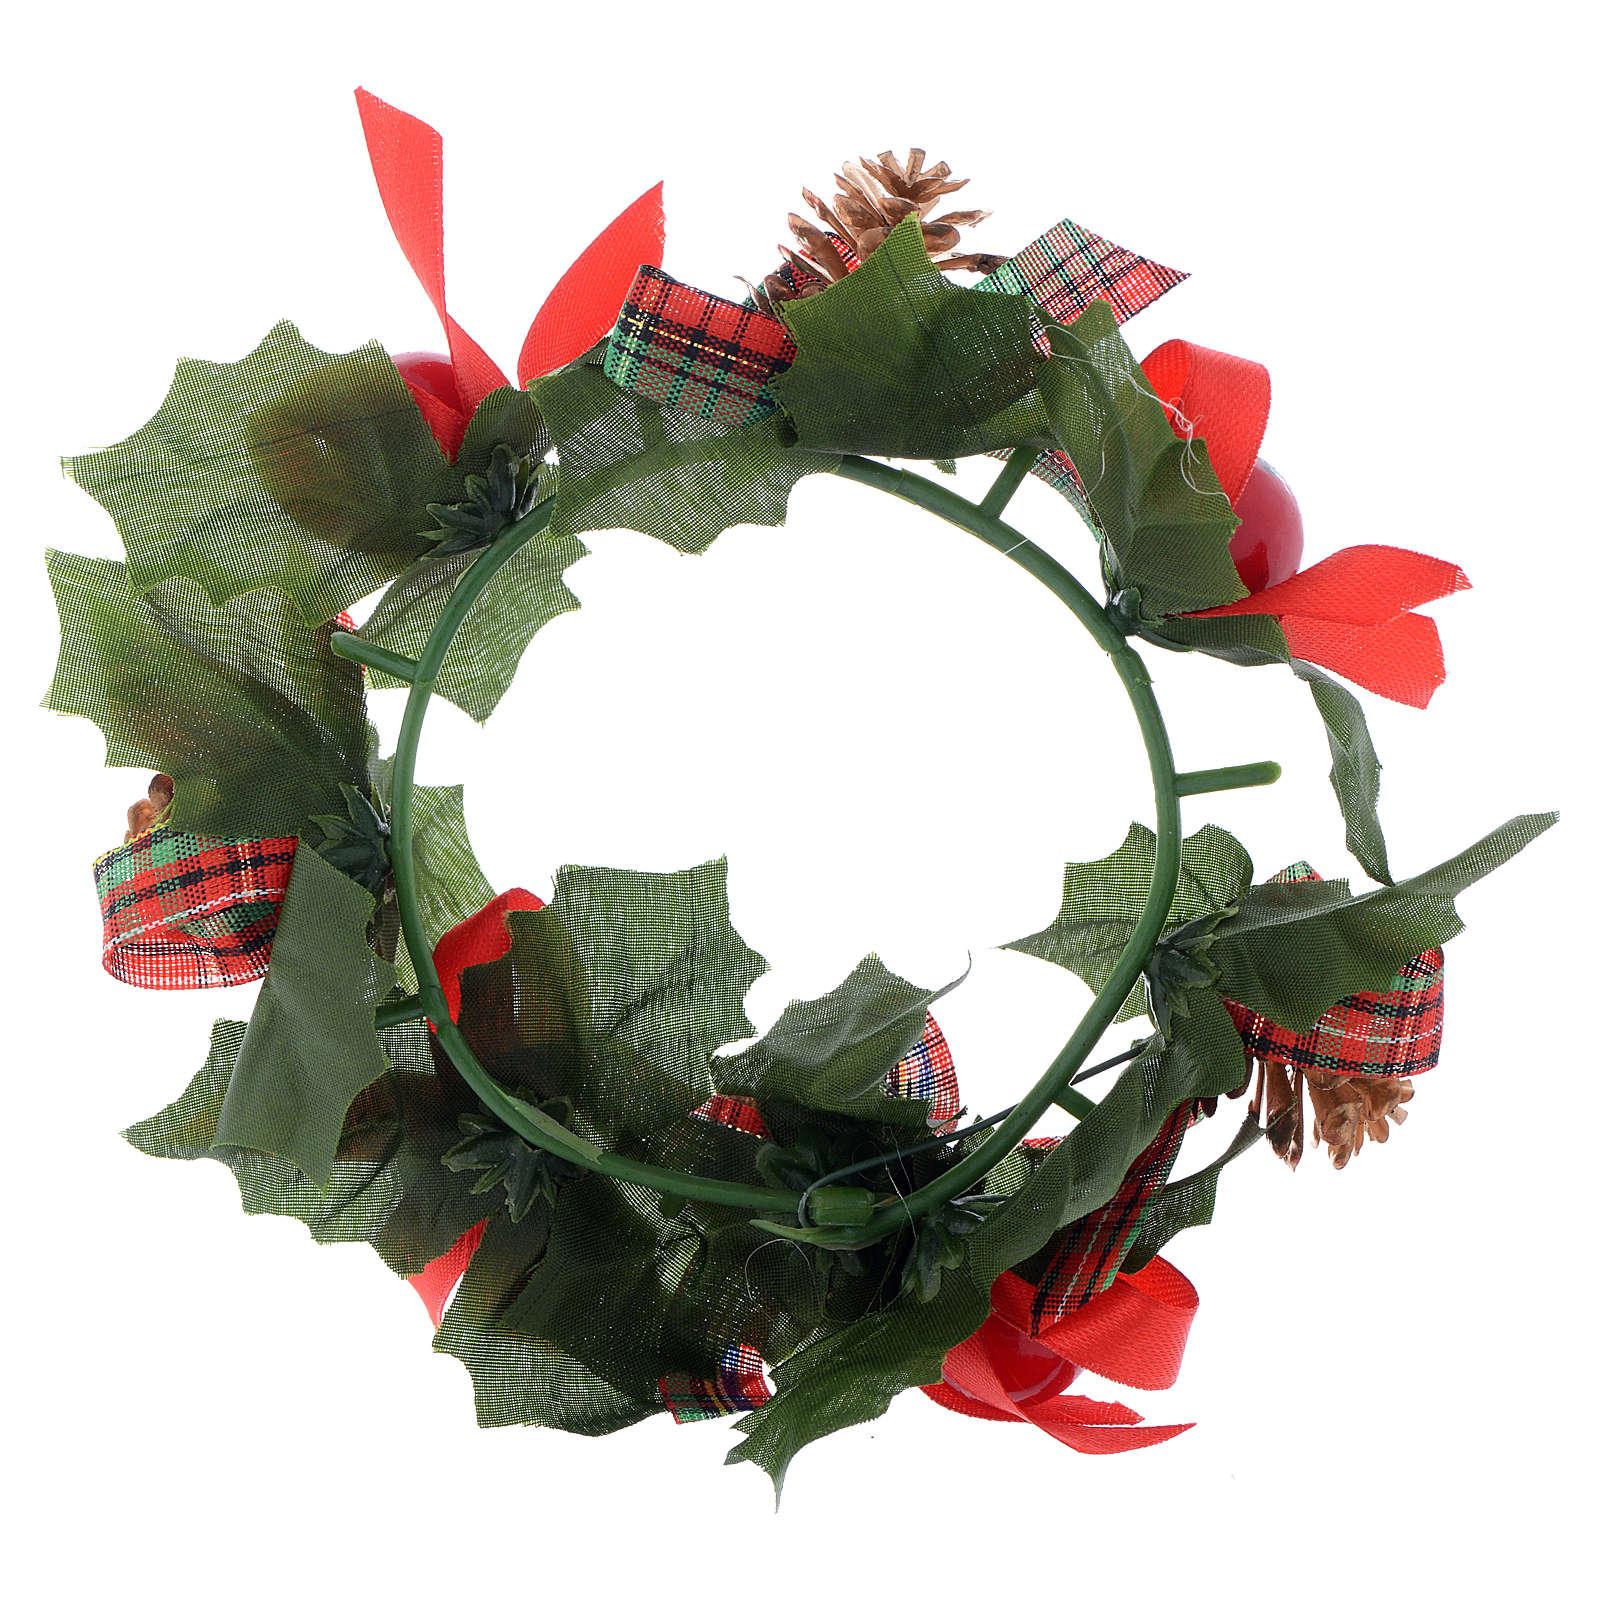 Girocandela di Natale (per candele classiche) pigne fiocchi 3